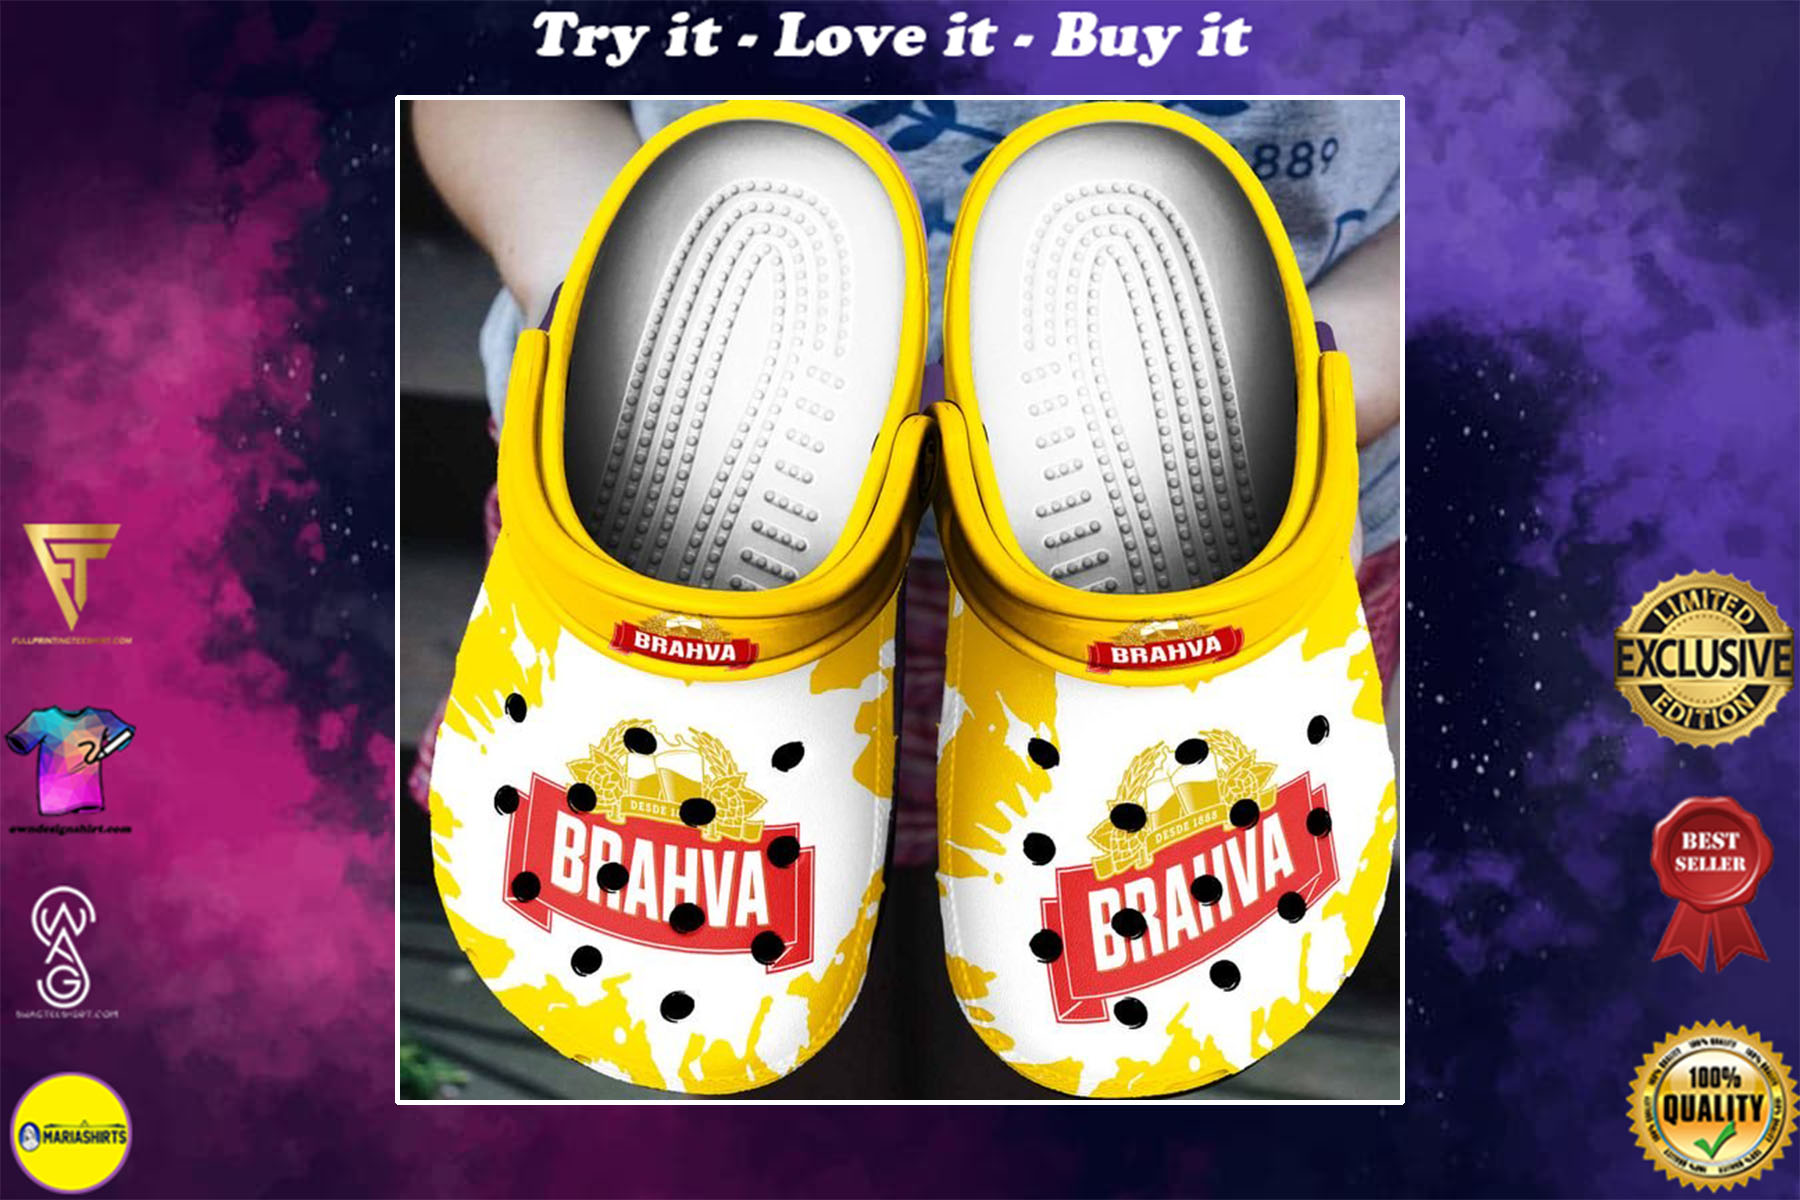 [special edition] brahma beer crocs shoes - maria